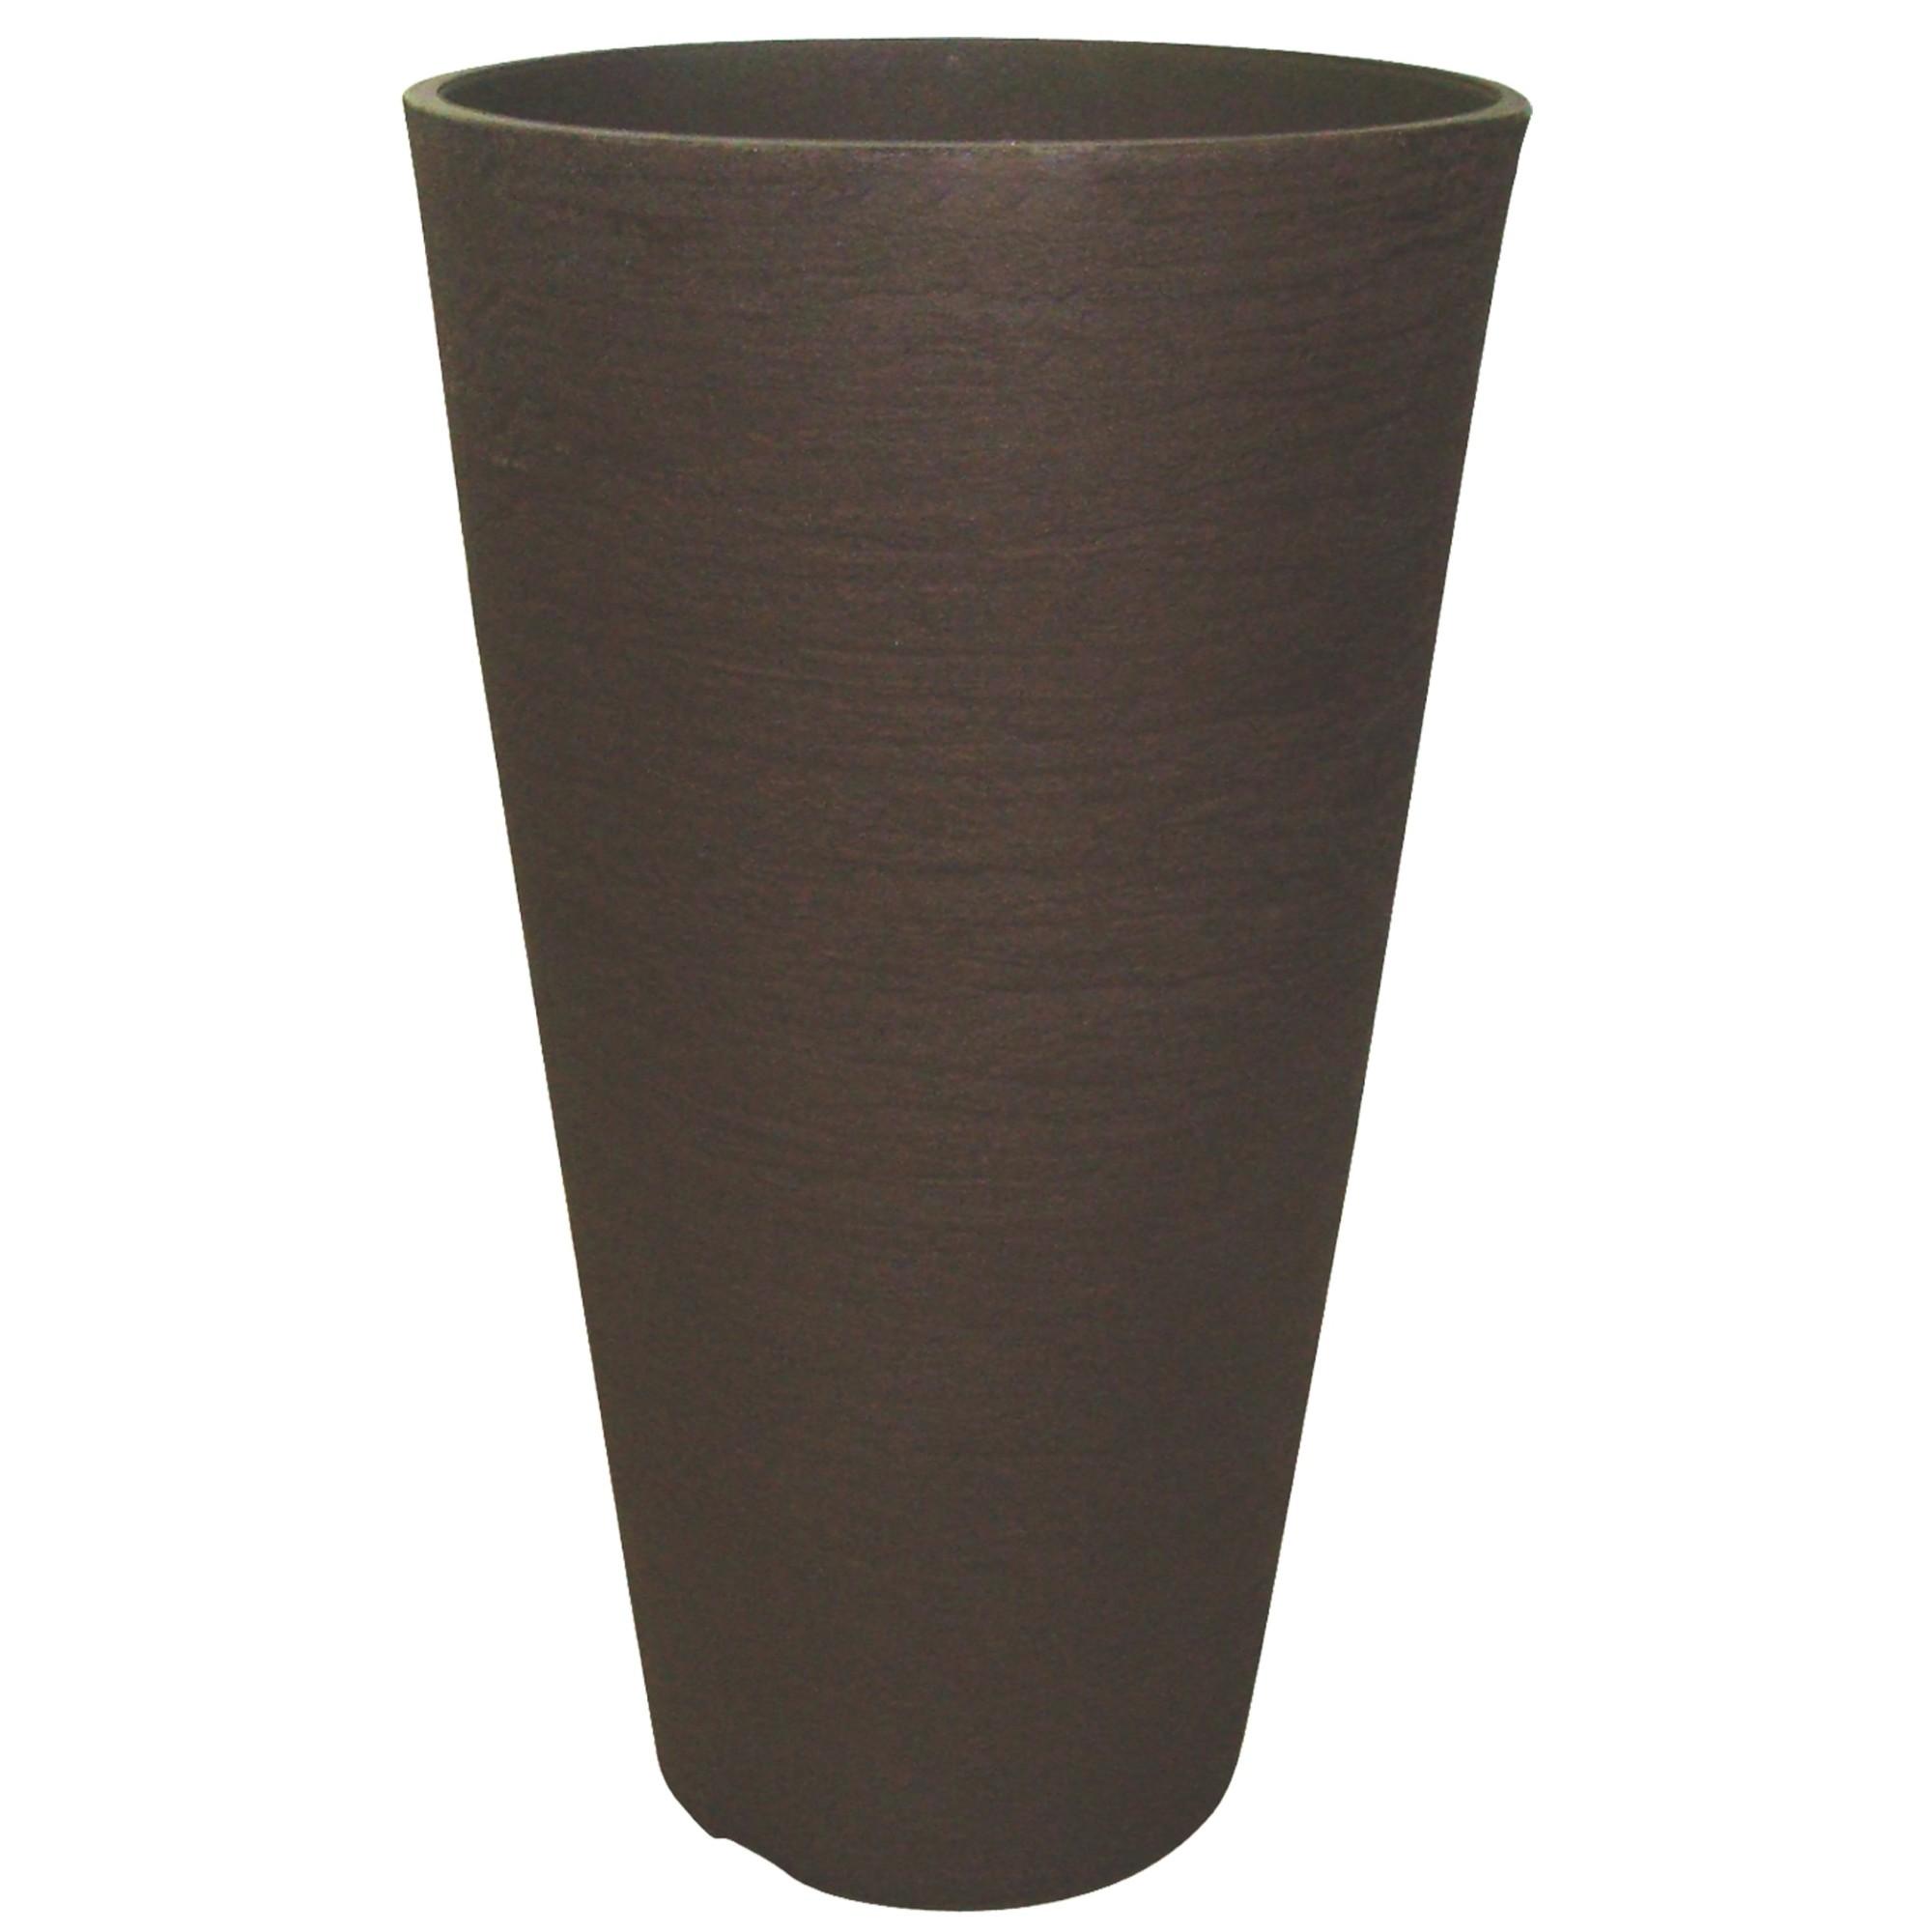 Vaso para Plantas Polietileno 45x30 cm Europa Cafe - Japi